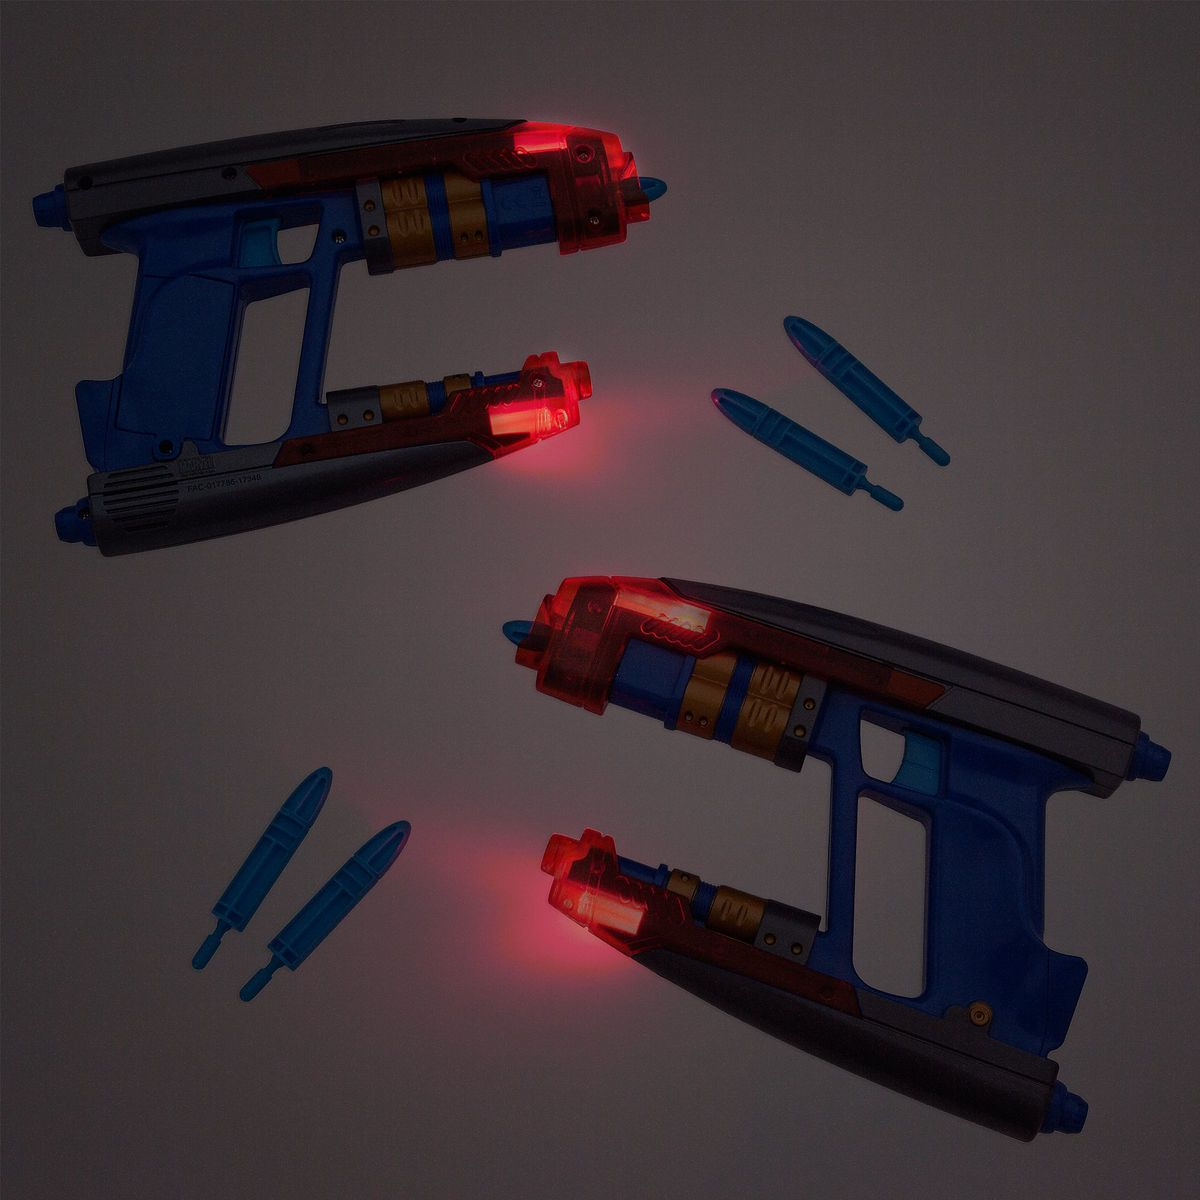 MARVEL Star-Lord élément Blasters-Avengers infinity war